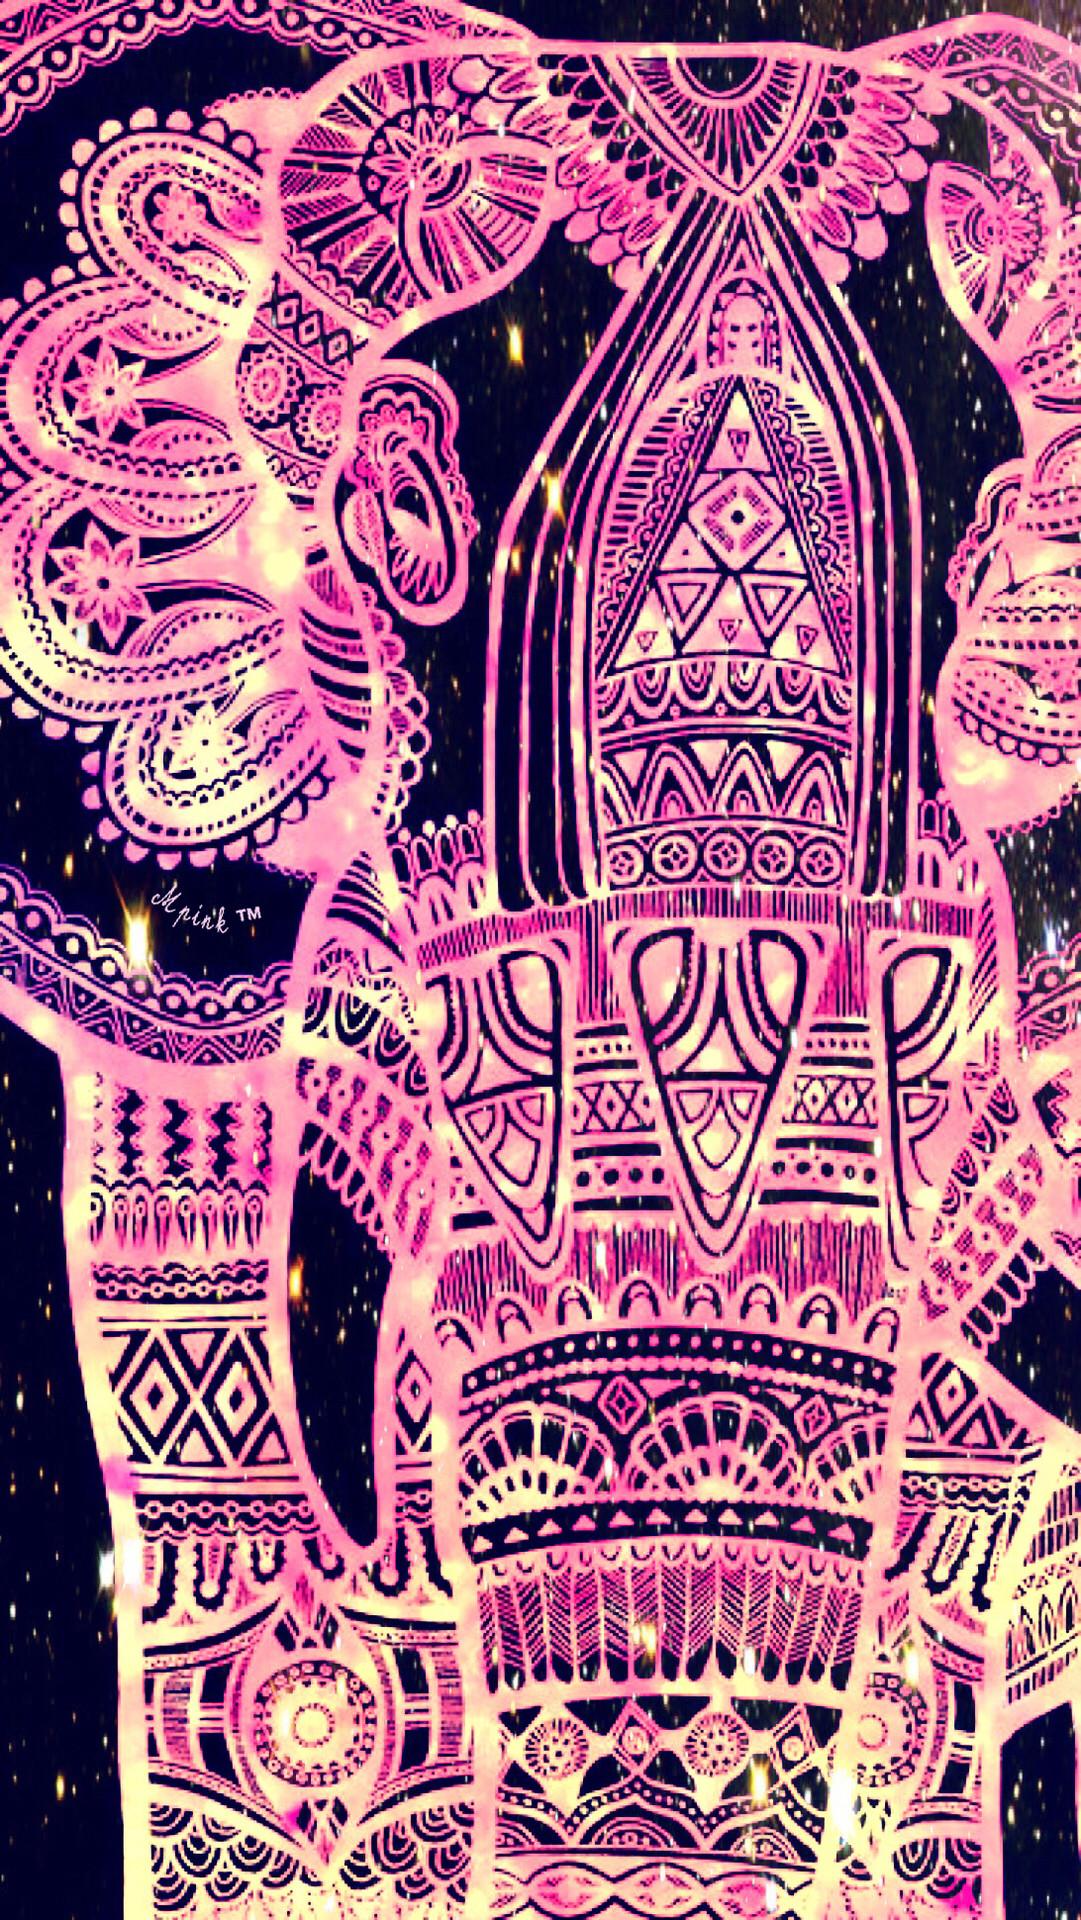 Tribal Pink Elephant Wallpaper/lockscreen Girly, Cute, - Girly Cute Elephant - HD Wallpaper